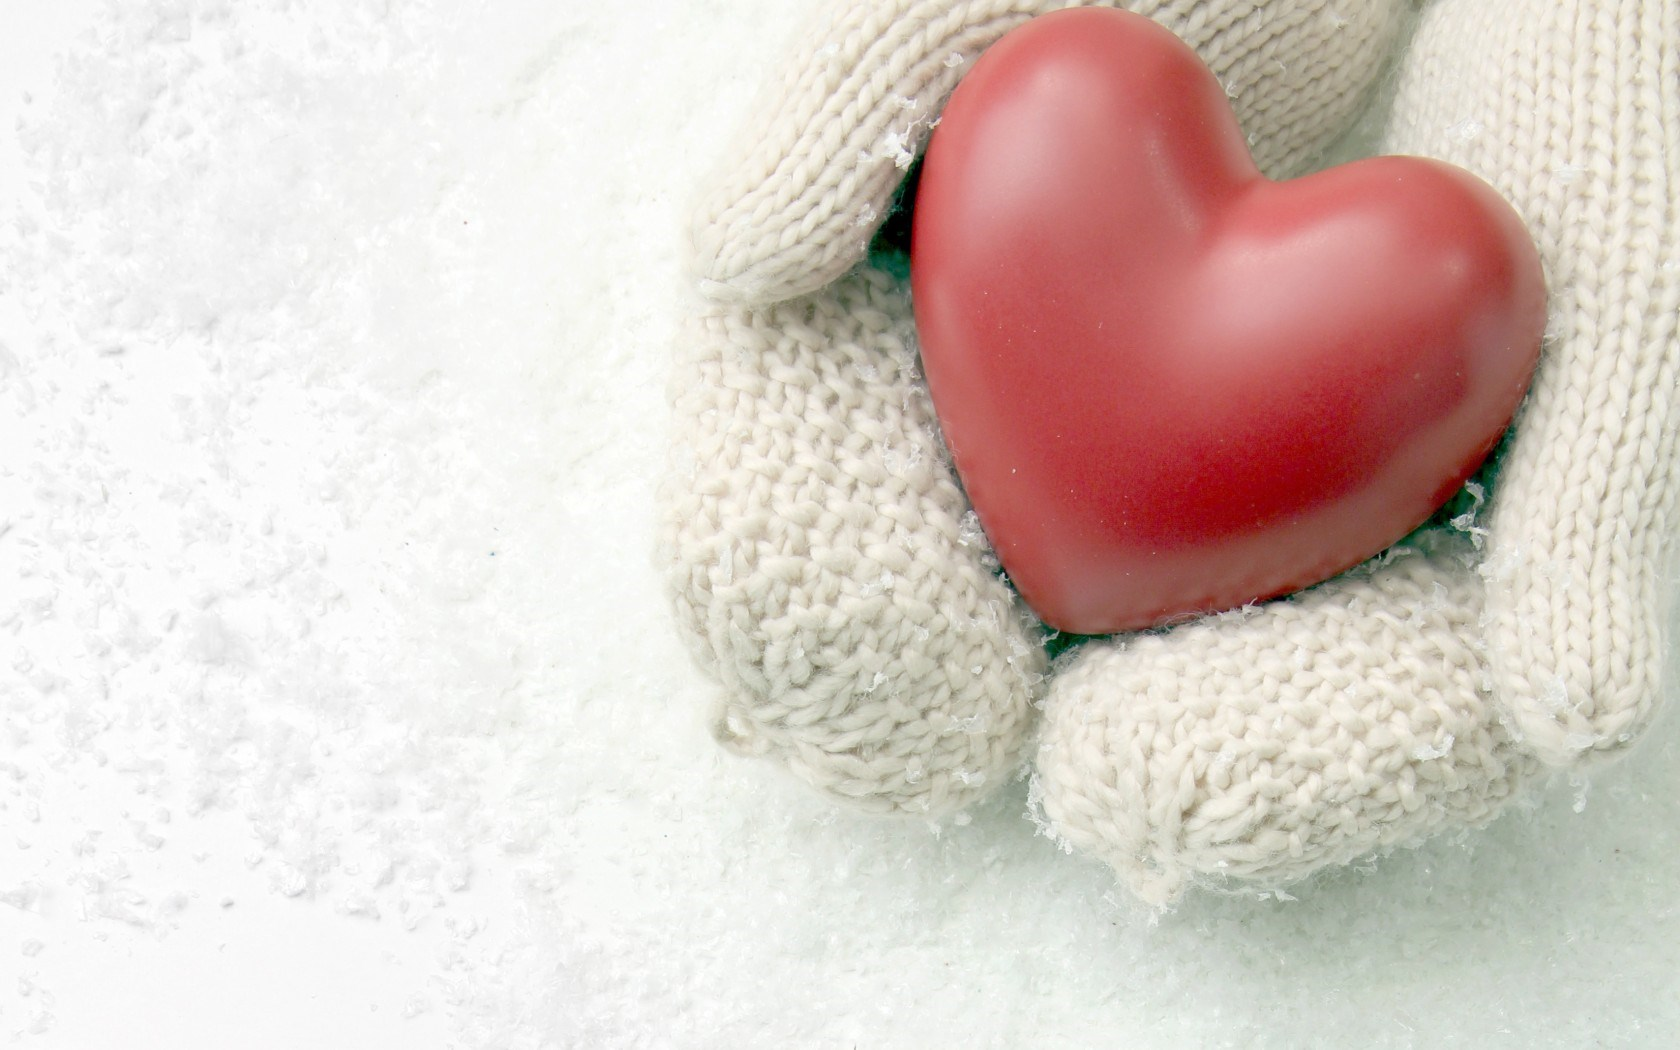 guarda tu corazon